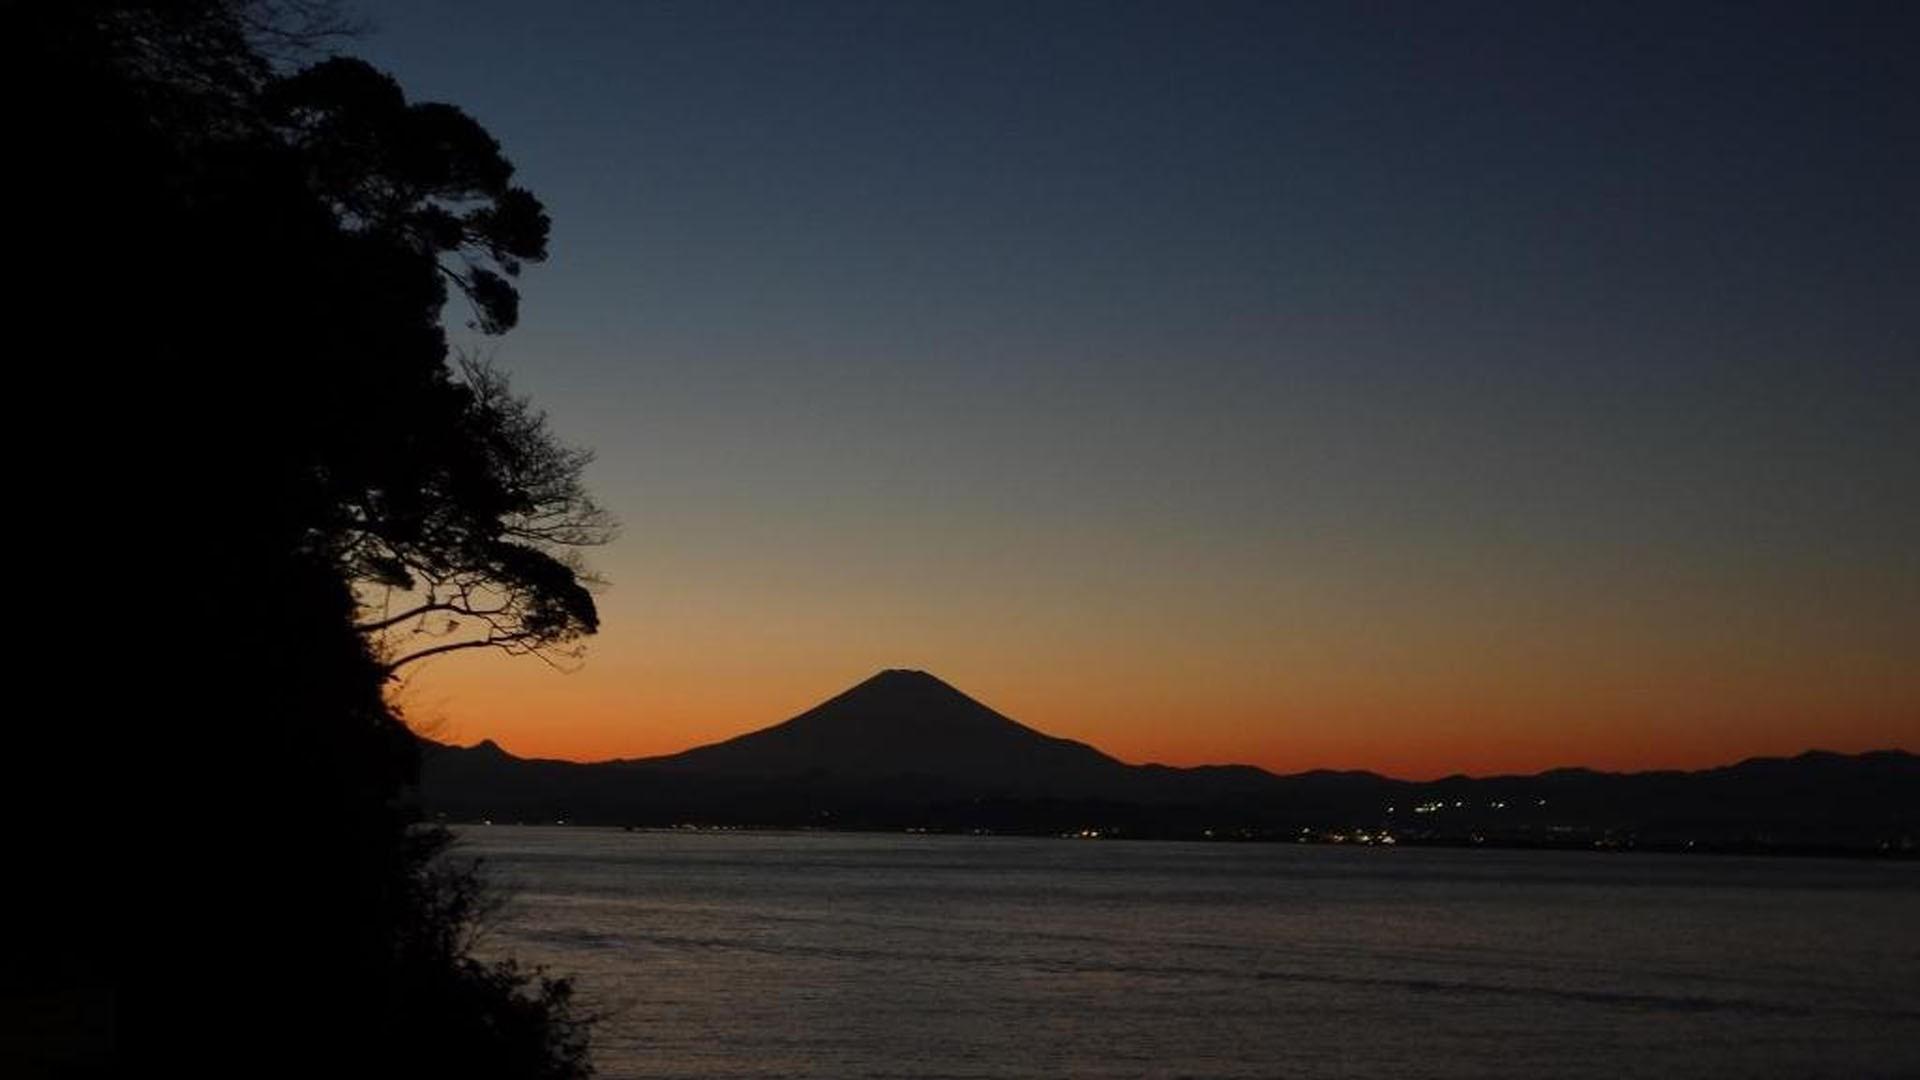 Fuji Aussichtspunkt in Enoshima